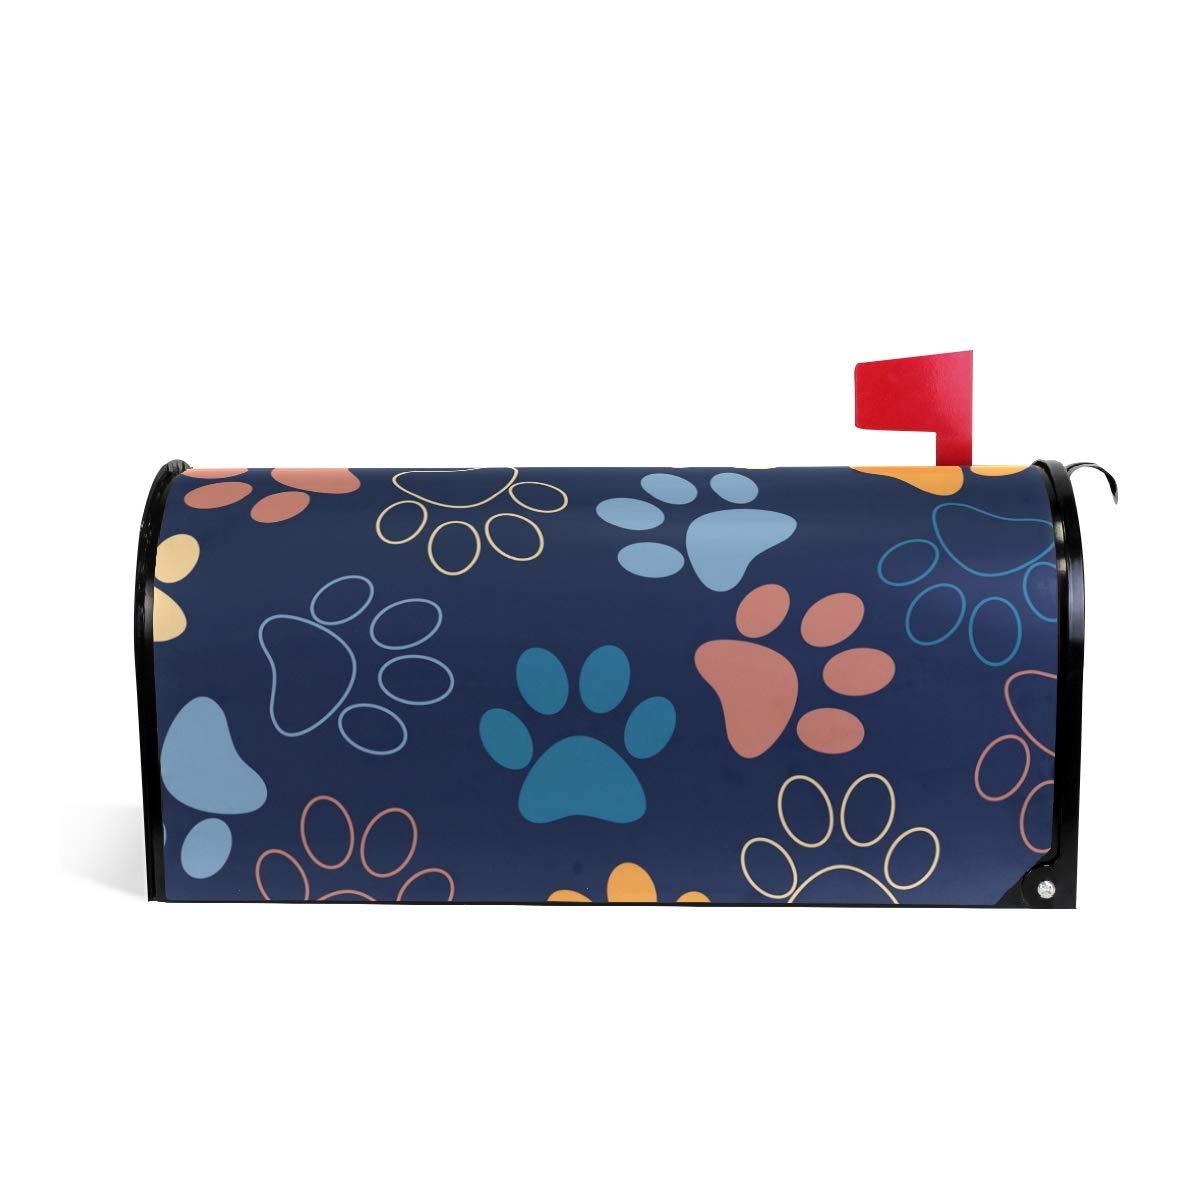 senya Home Garden Cat Or Dog Footprints Pattern Magnetic Mailbox Cover Standard by senya